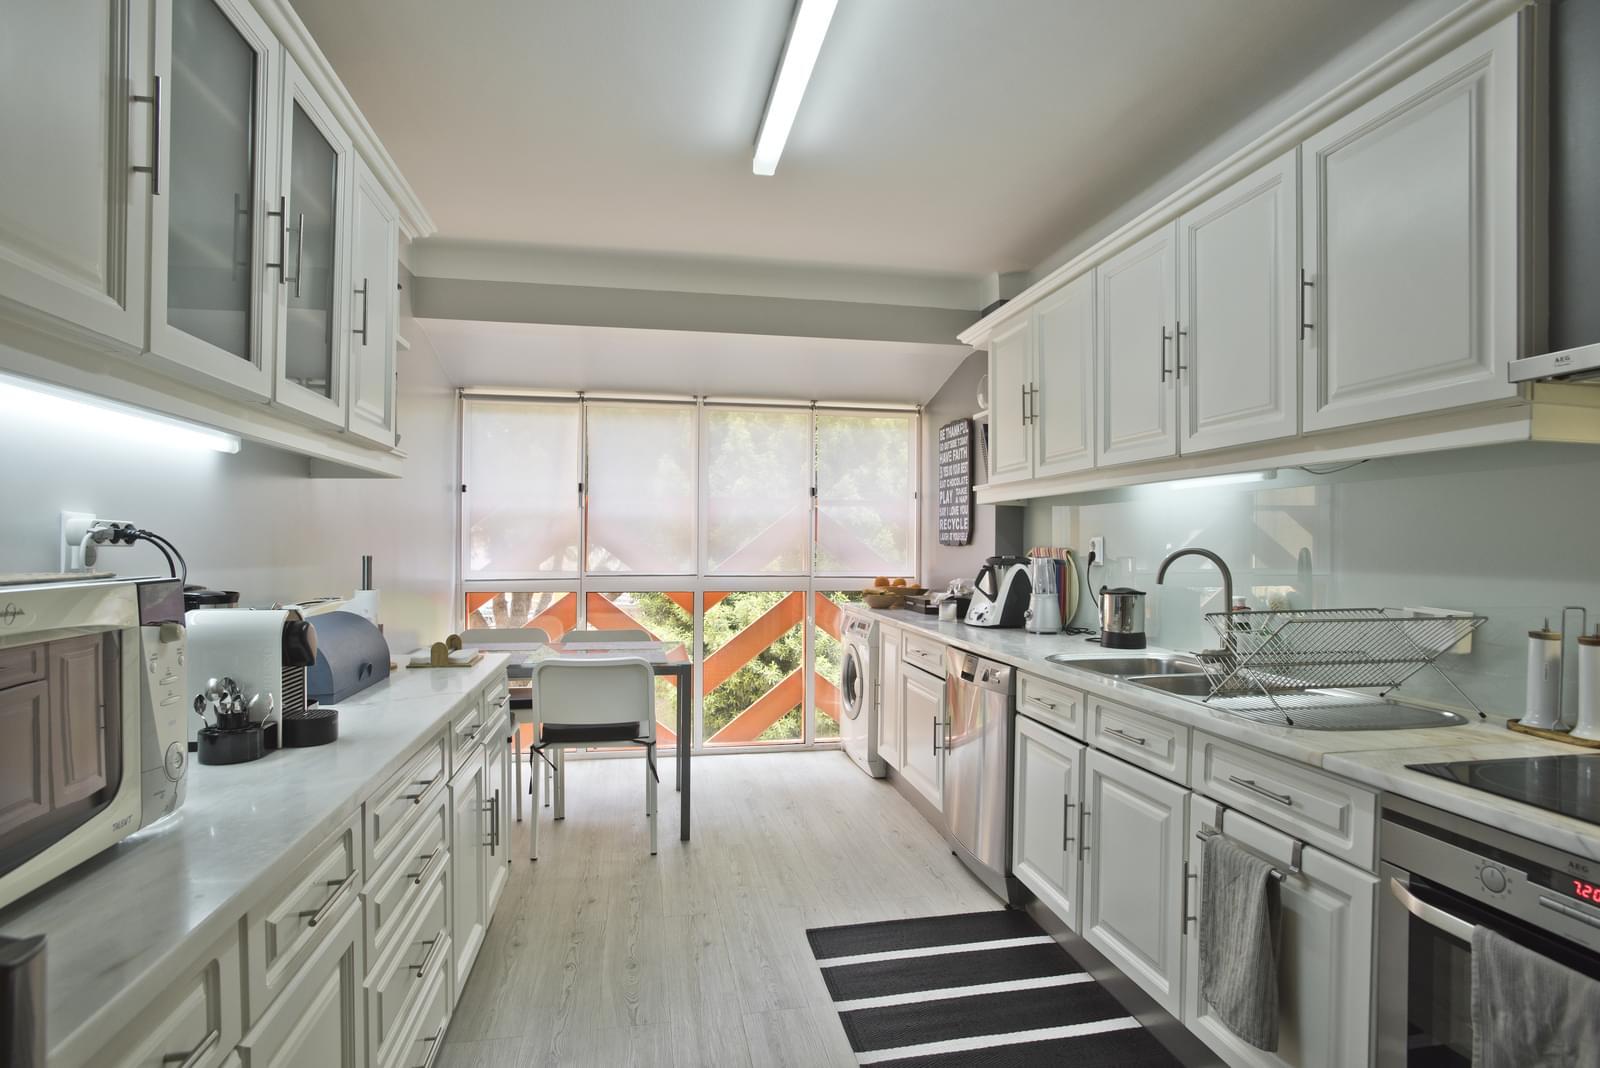 pf17230-apartamento-t3-cascais-99e40ea3-2354-41e2-b5d3-da5352ed220d